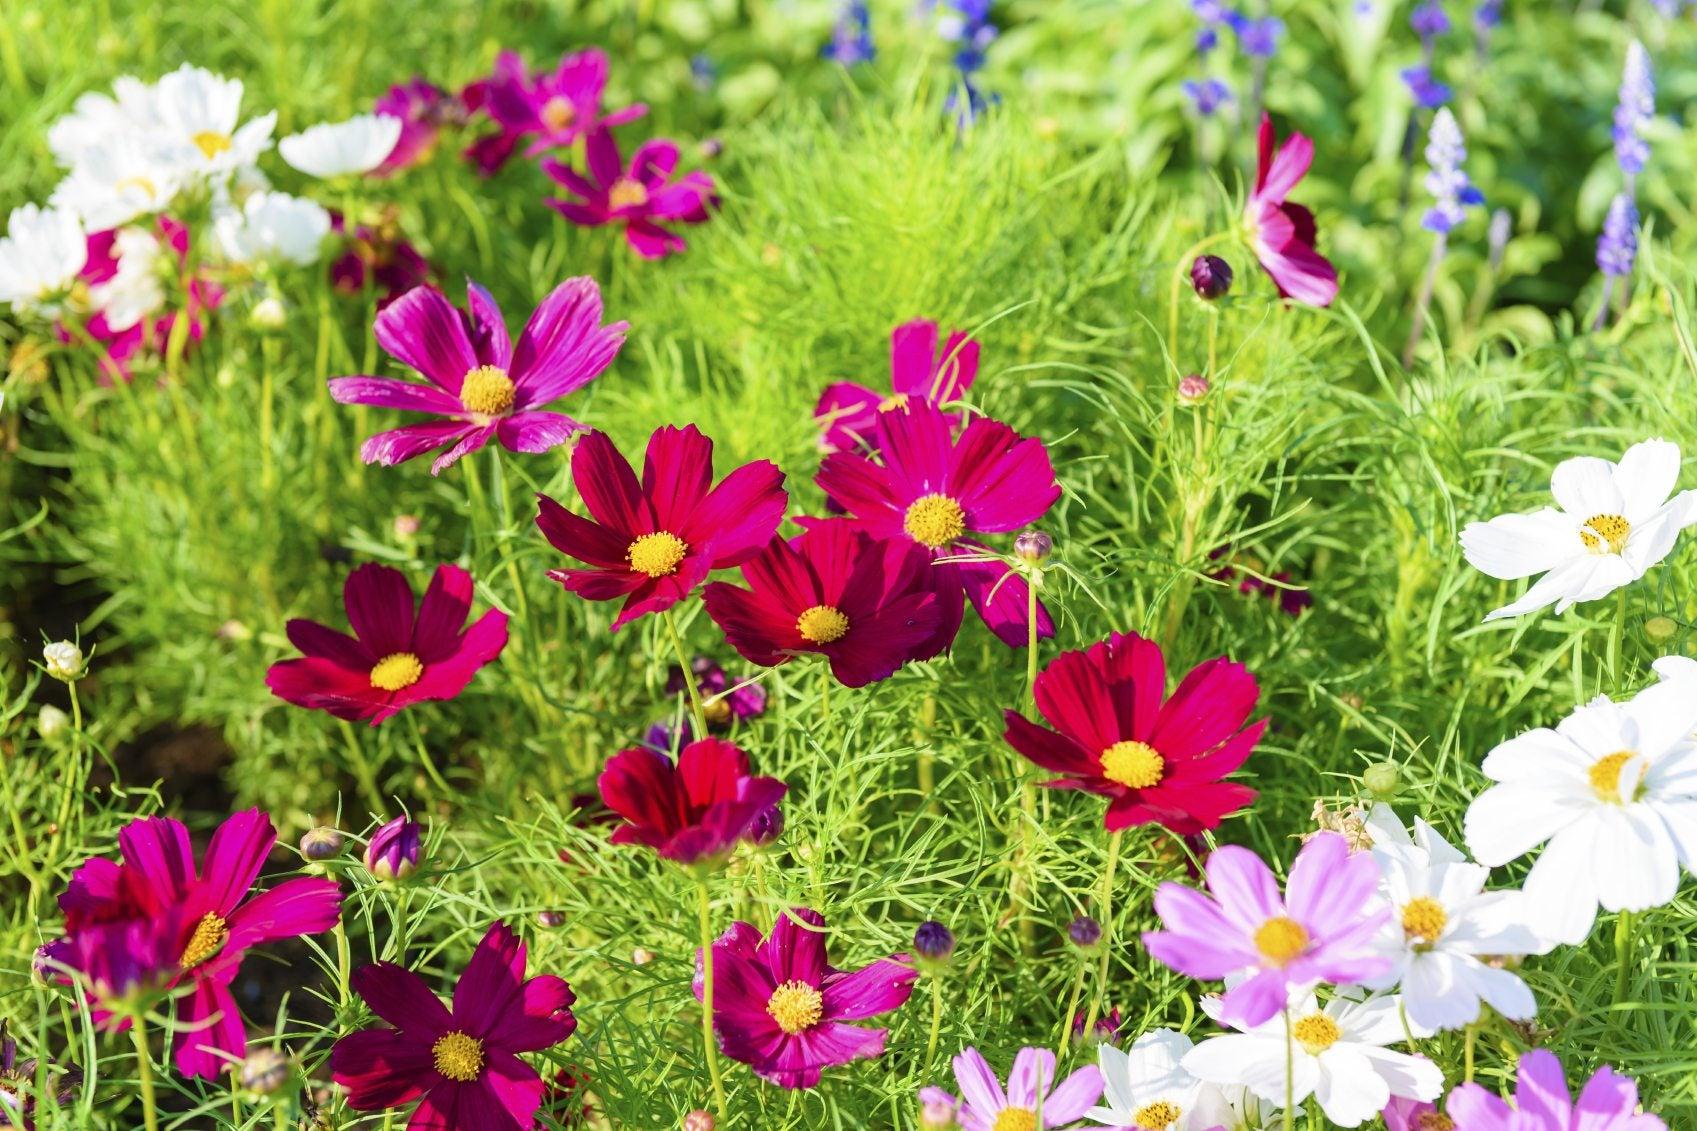 Cosmos Flower Colors Different Varieties Of Cosmos Flowers